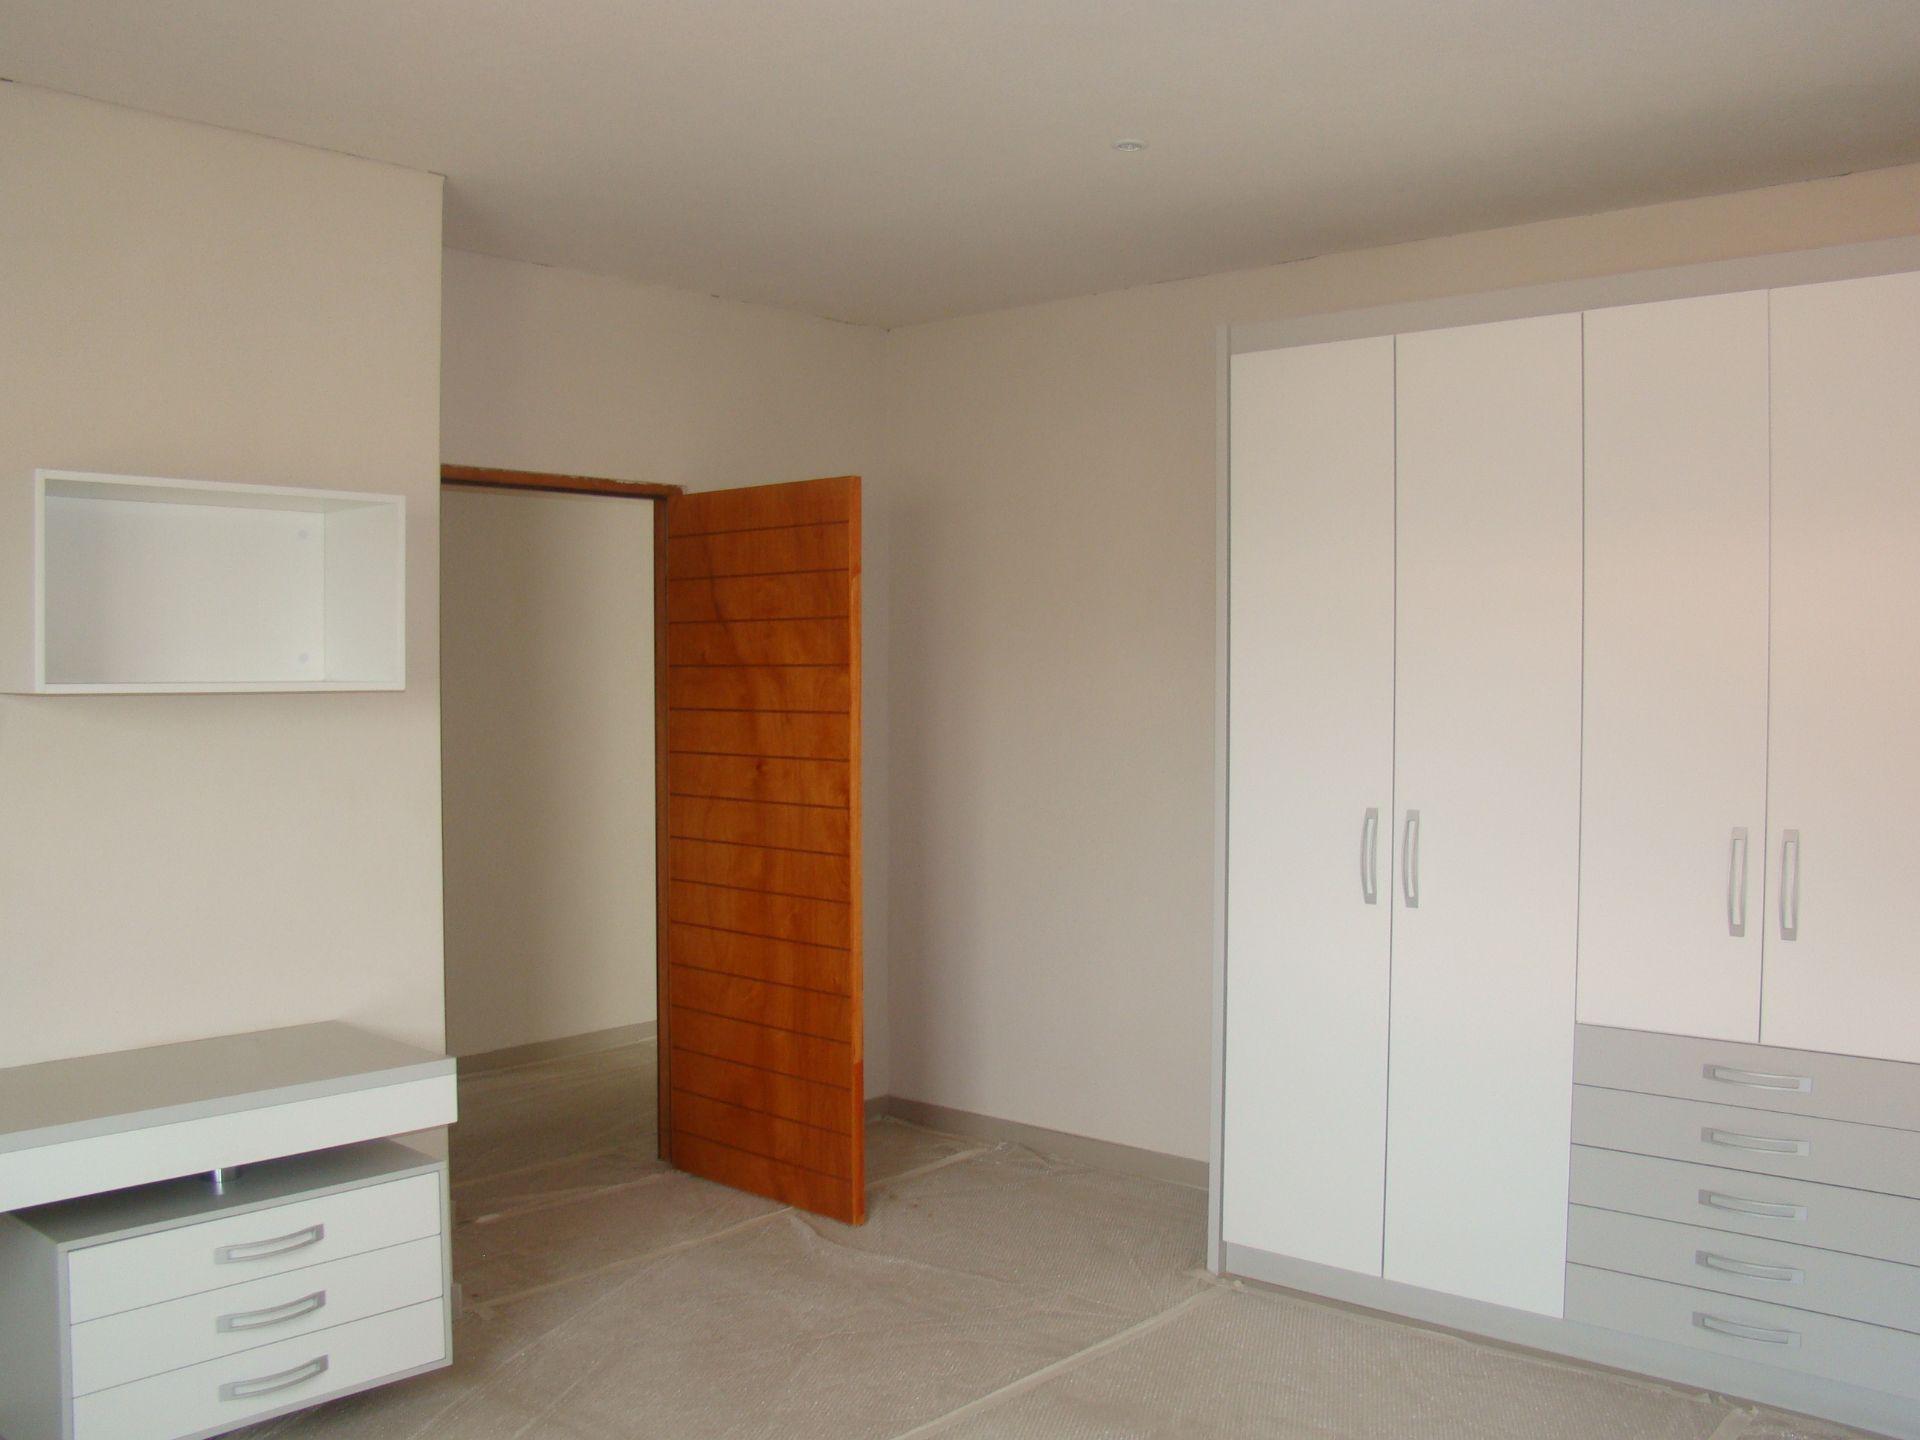 Craigavon 2nd bedroom cupboards.JPG